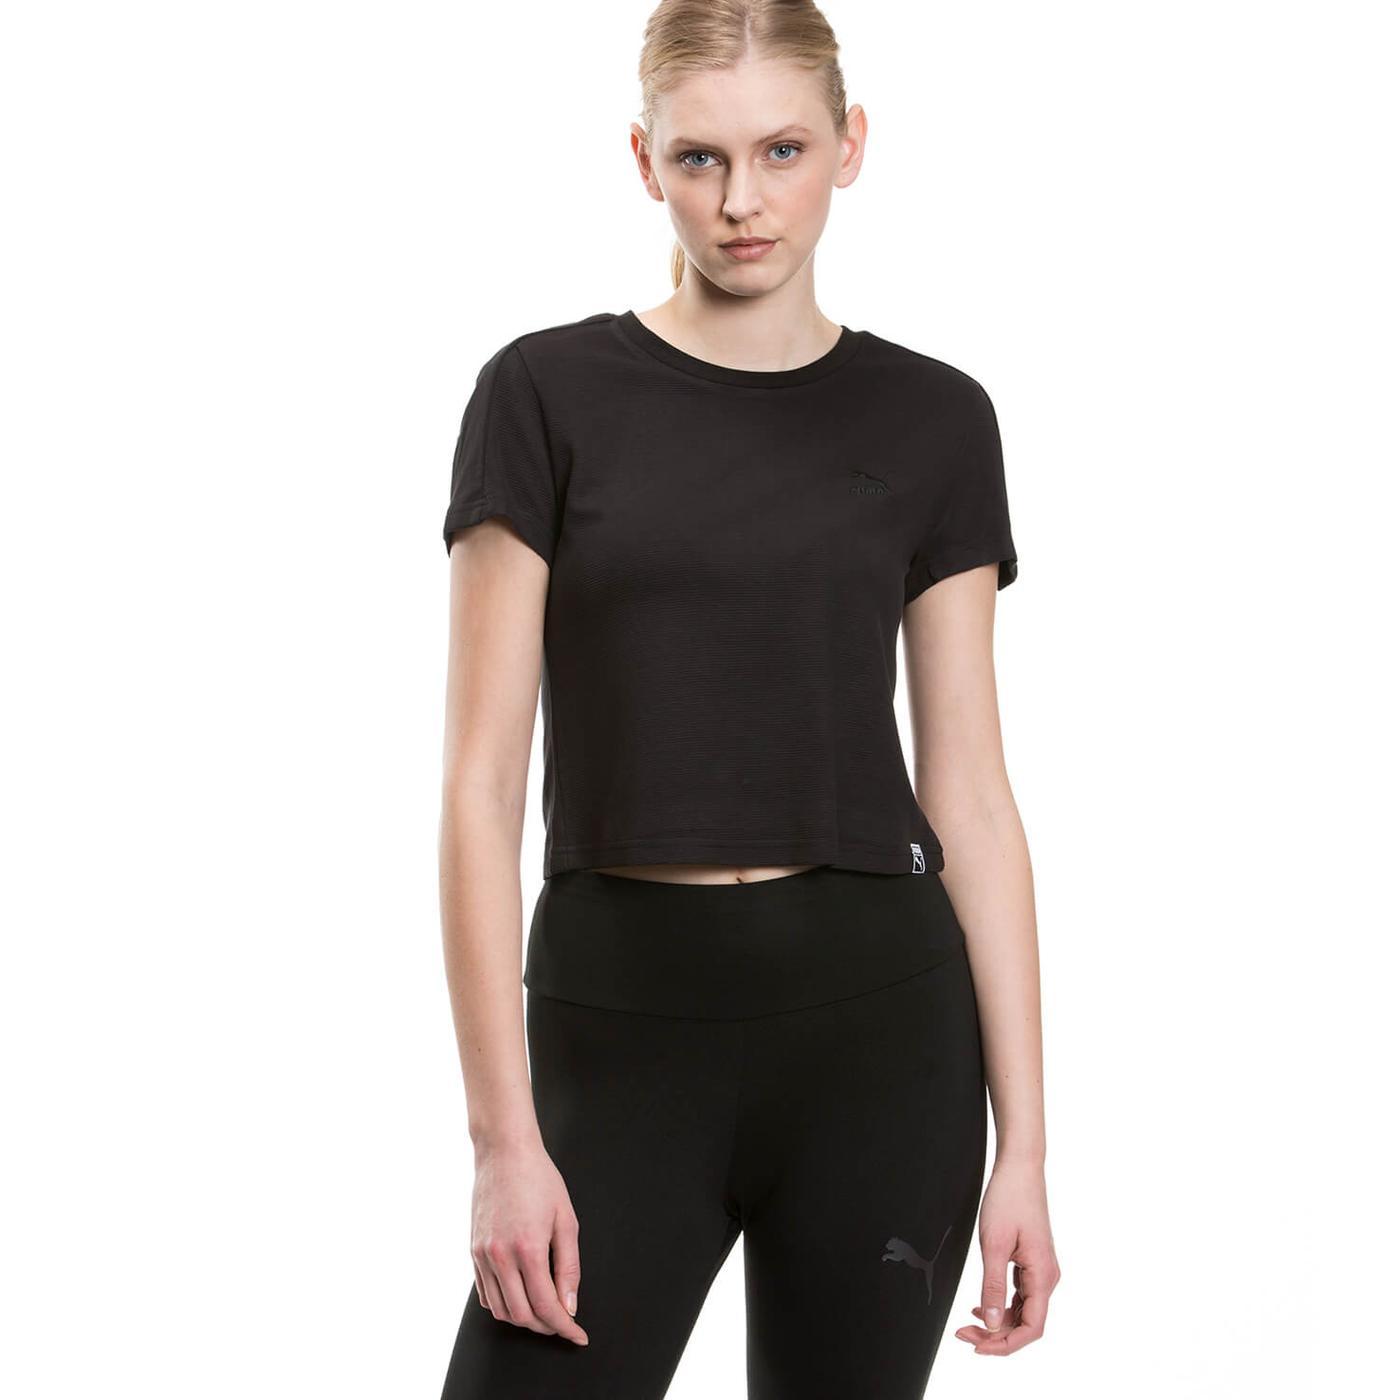 Puma Classic Structured Kadın Siyah Tshirt